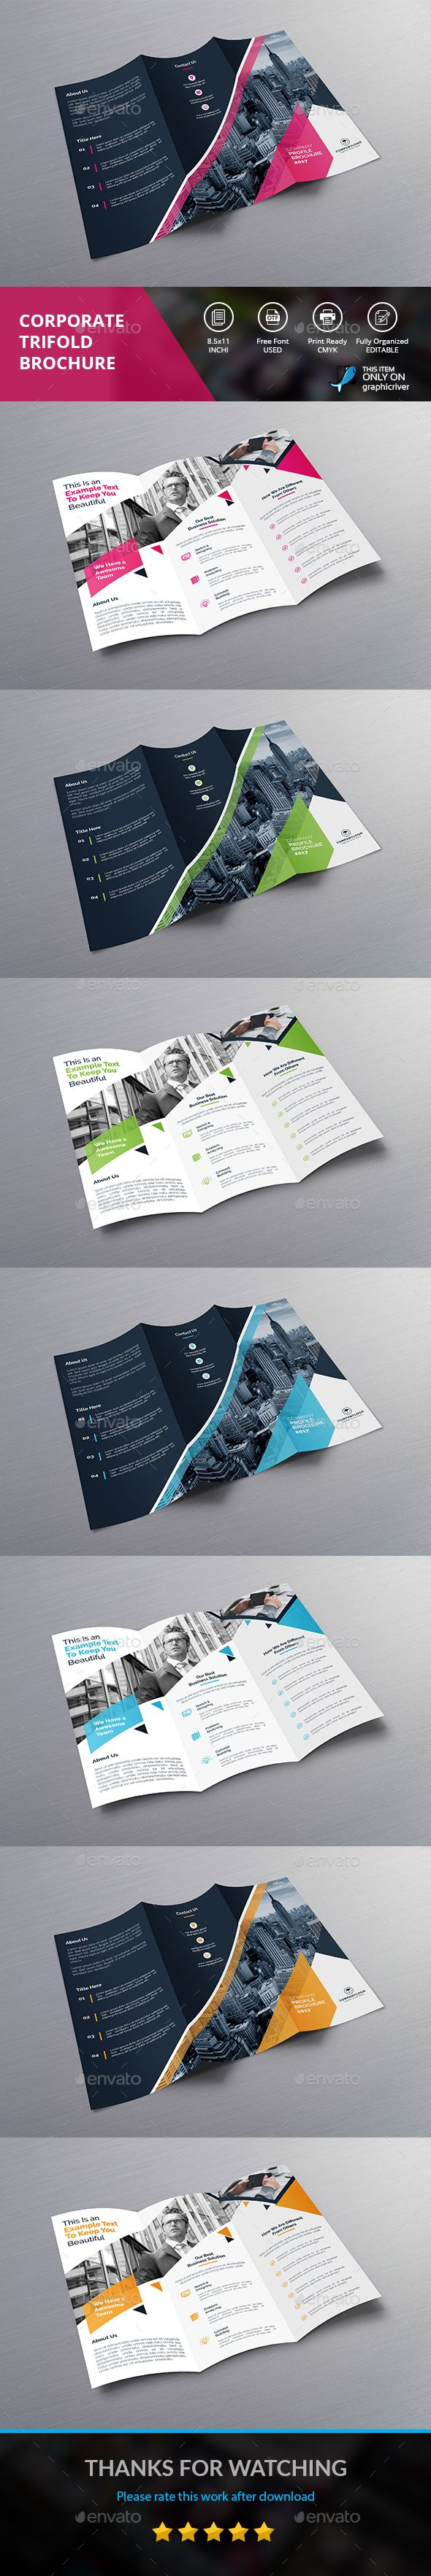 36 best print design images on pinterest print design print